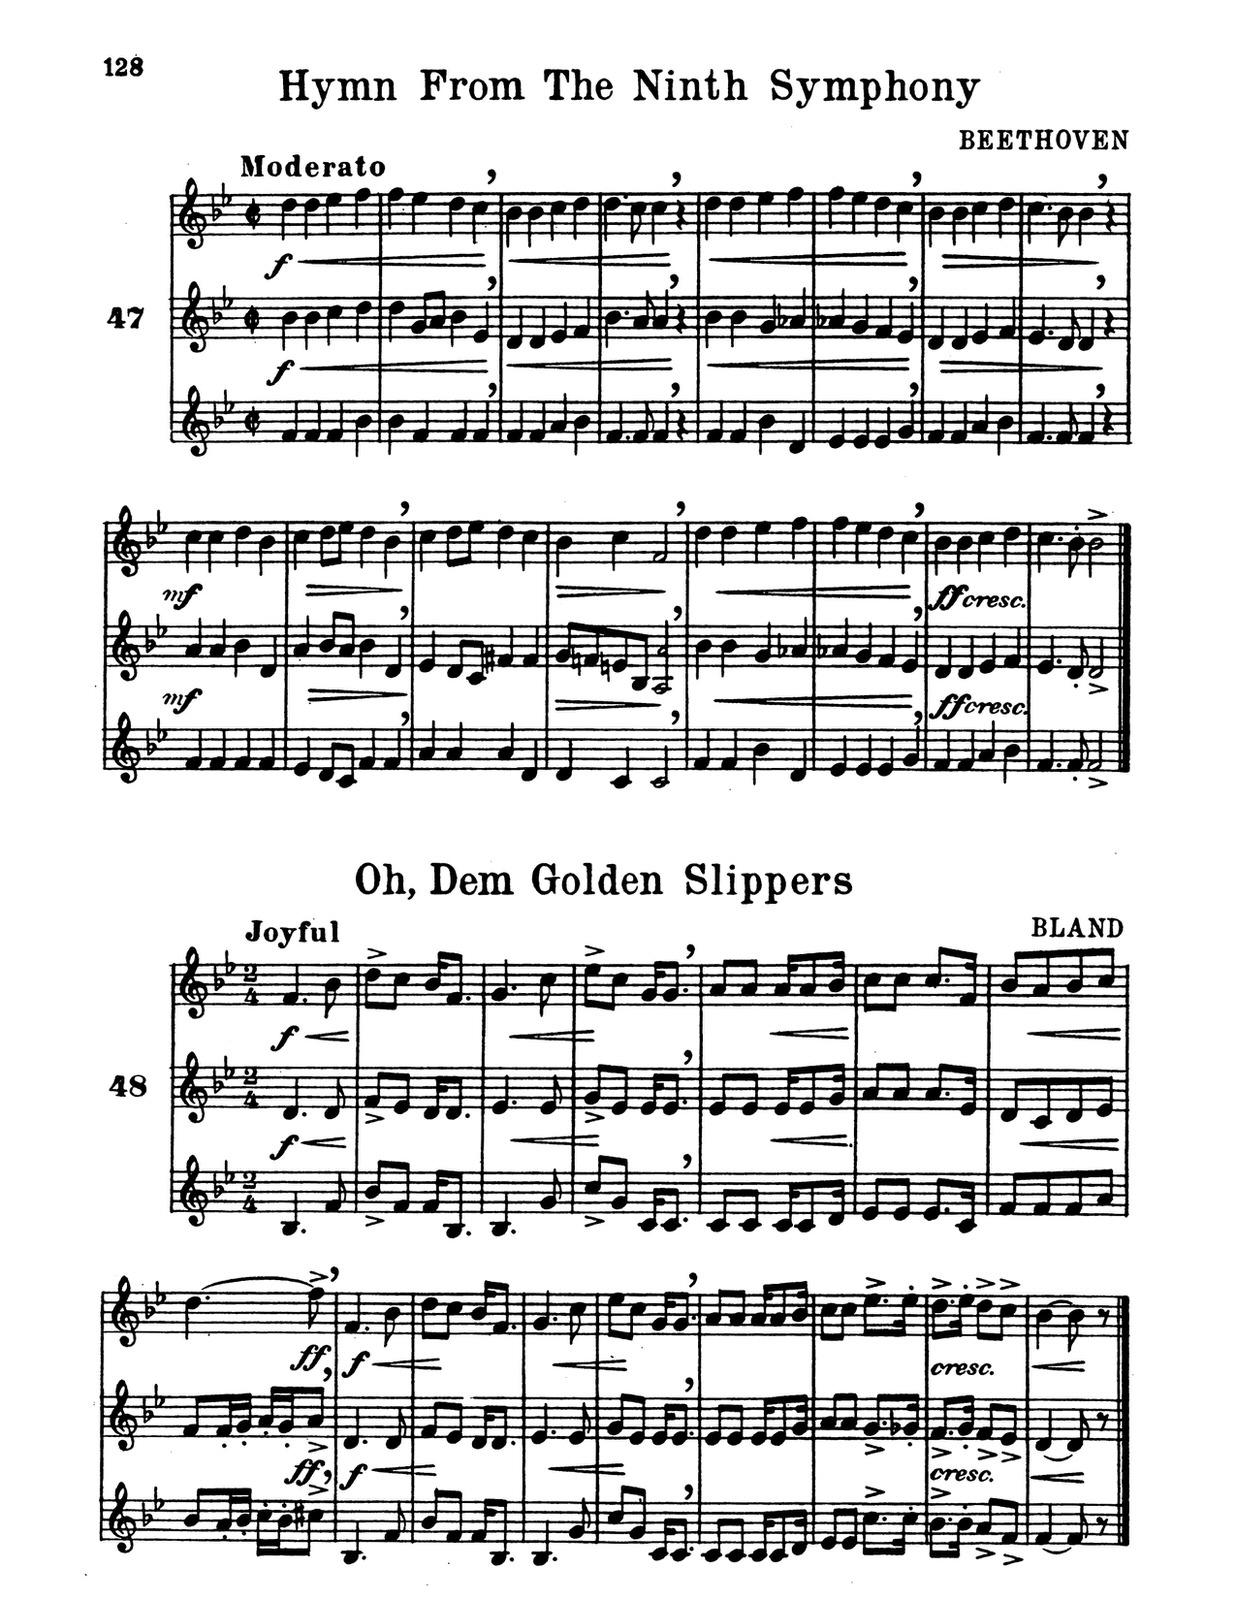 Schaefer, Tri-Form Method for Cornet 9